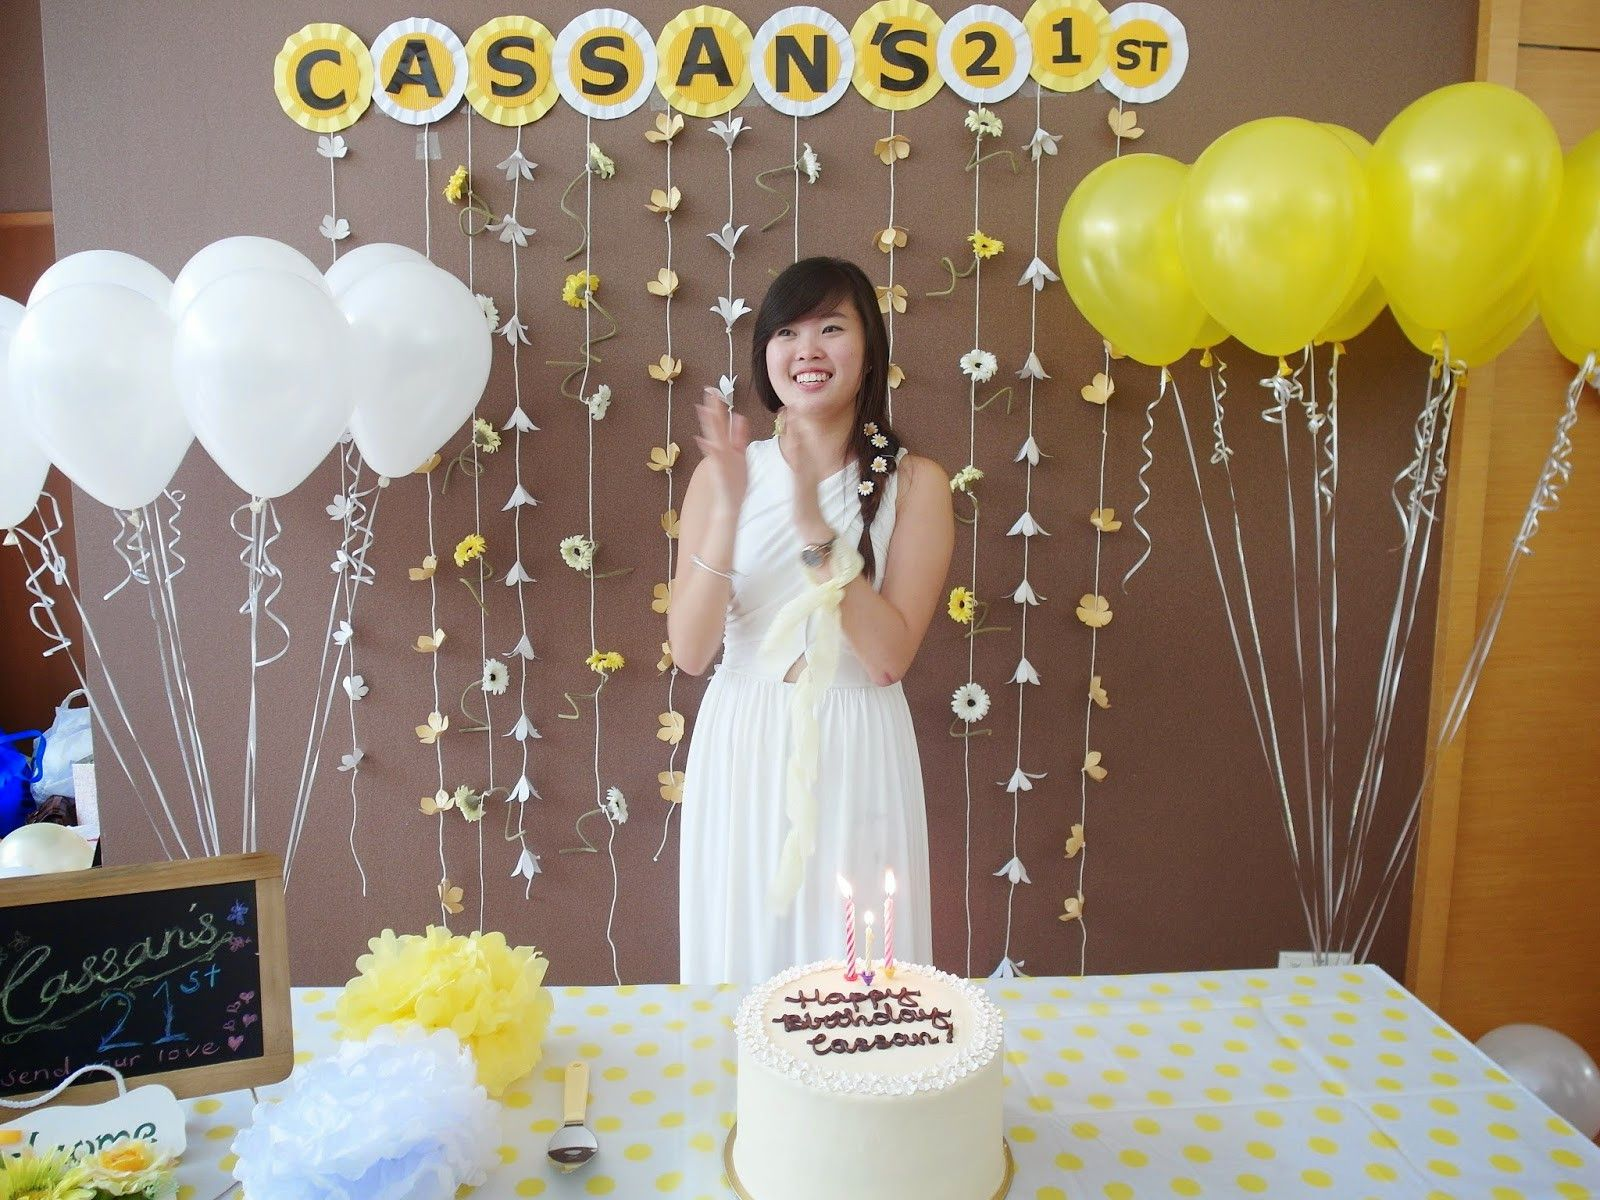 21st Top 20 21st Birthday Party Themes 21st Birthday Party Themes Birthday Party 21 Birthday Party Venues